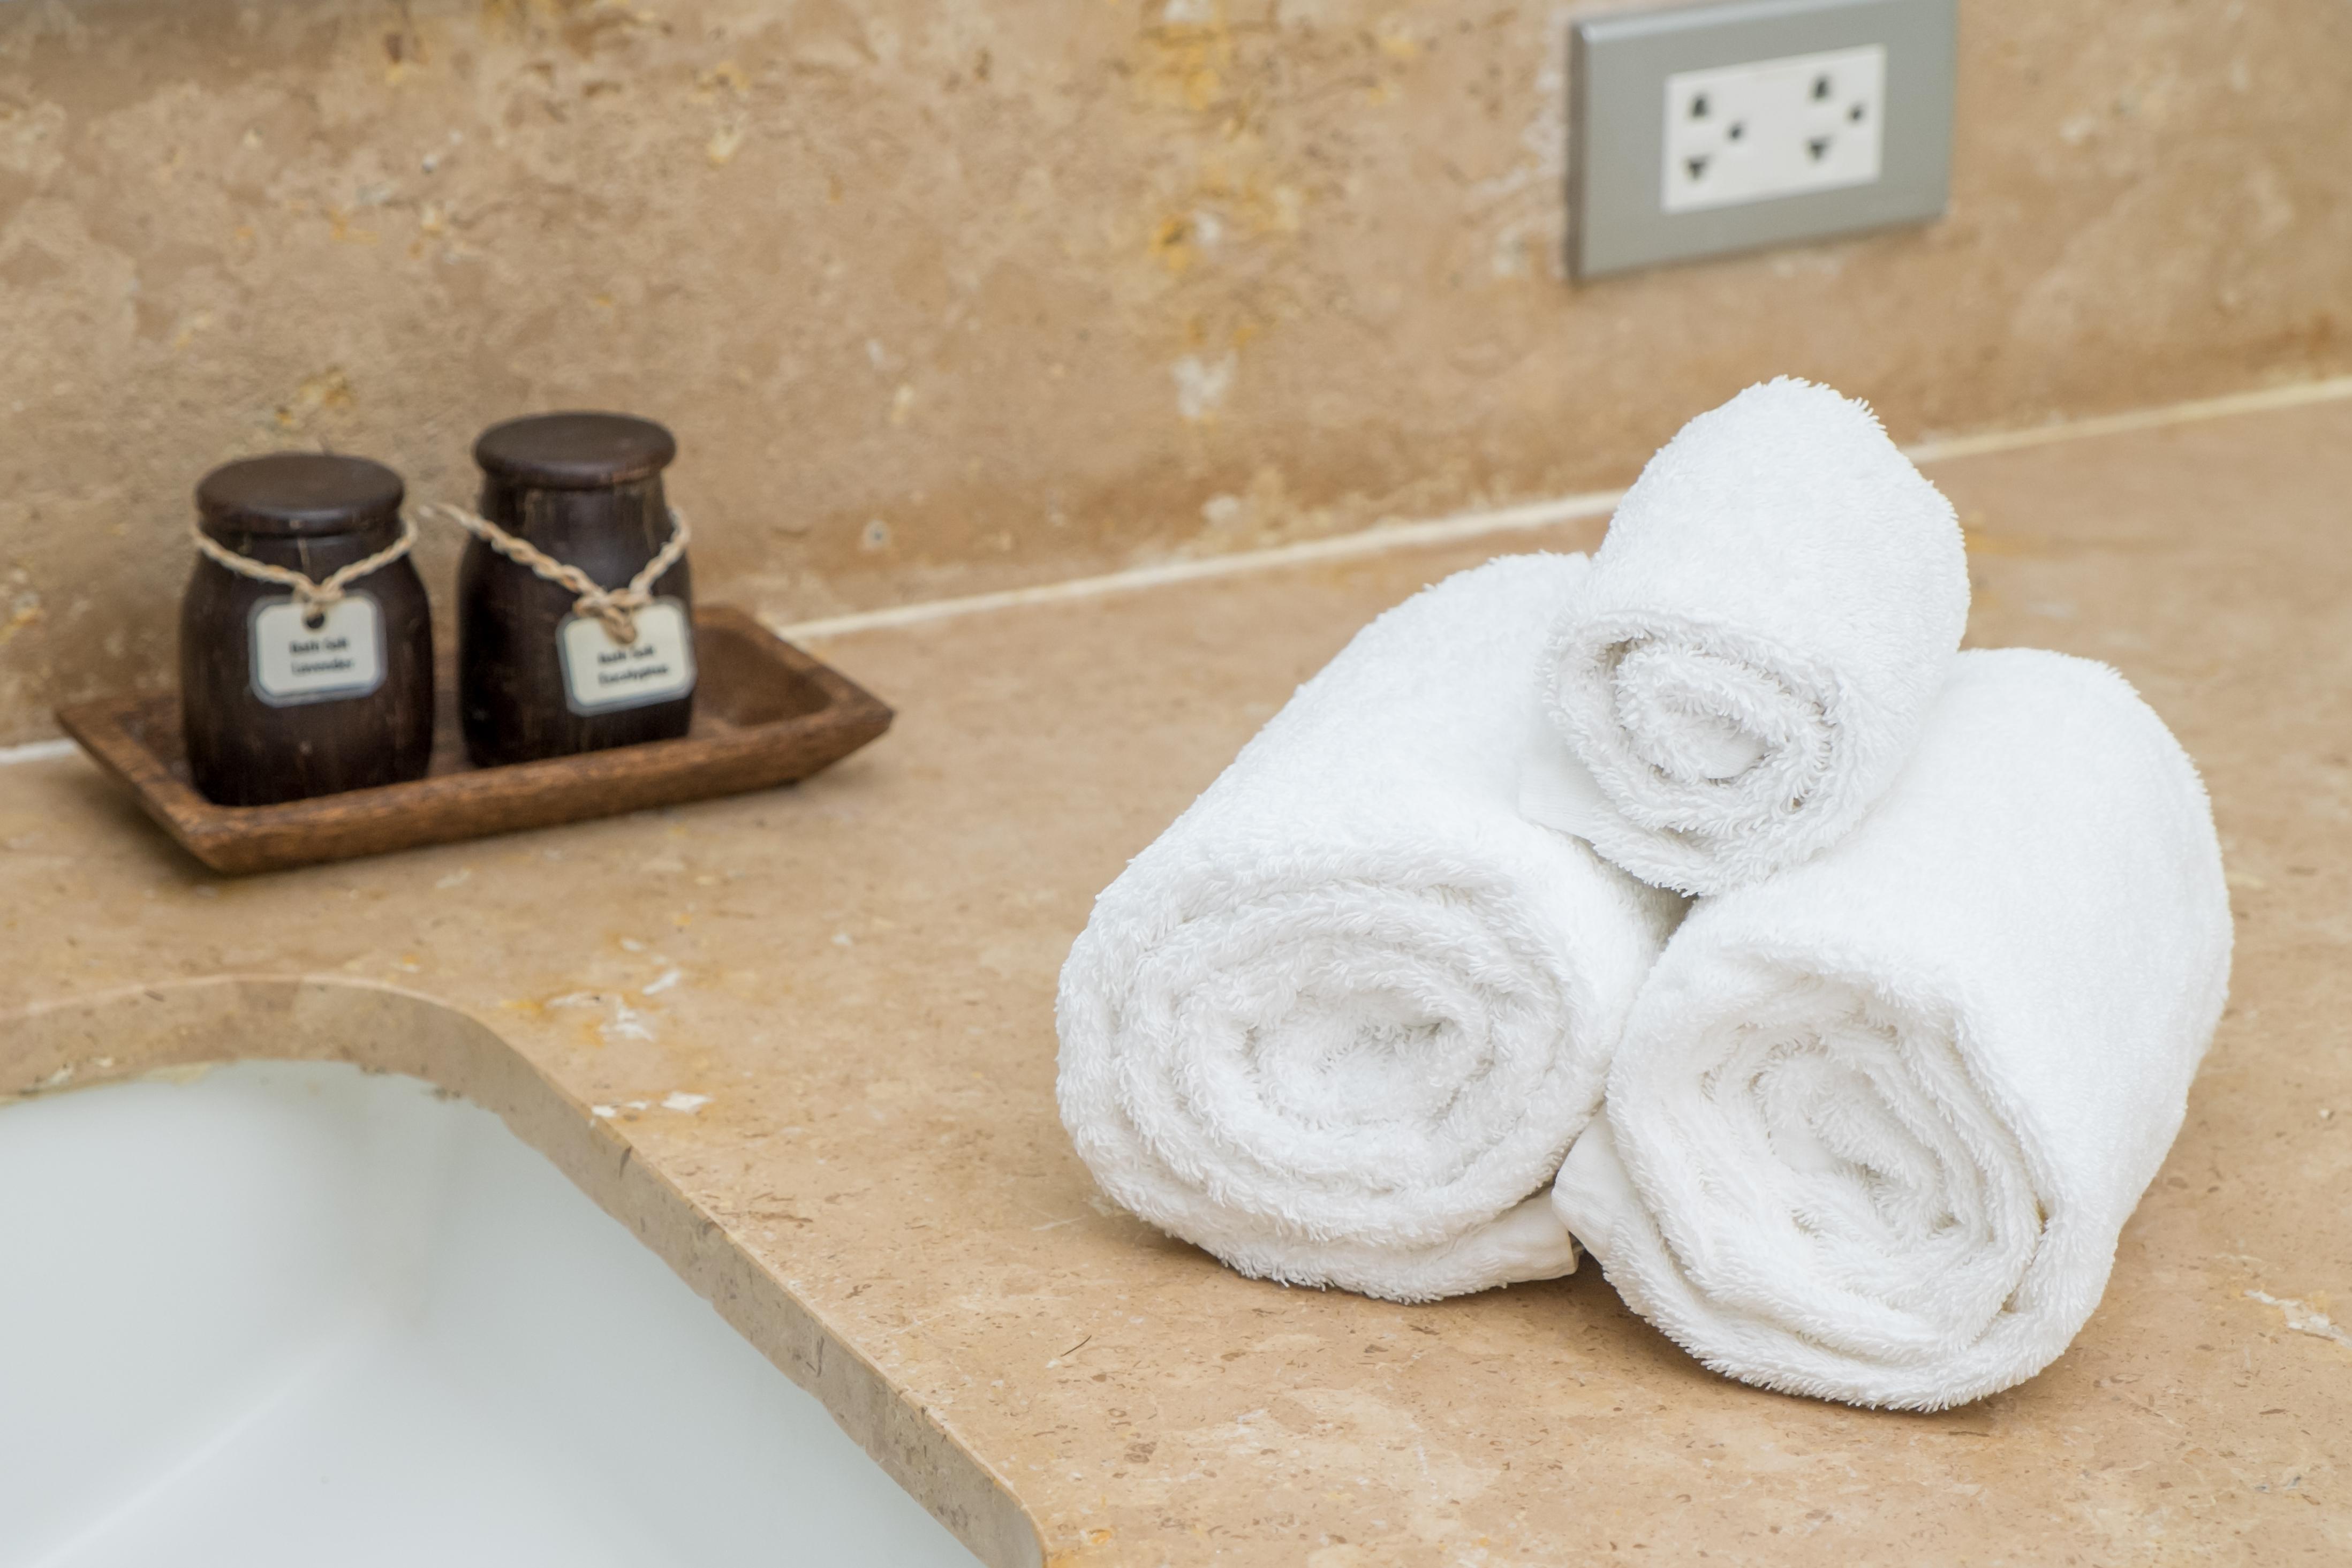 Hotel towels.